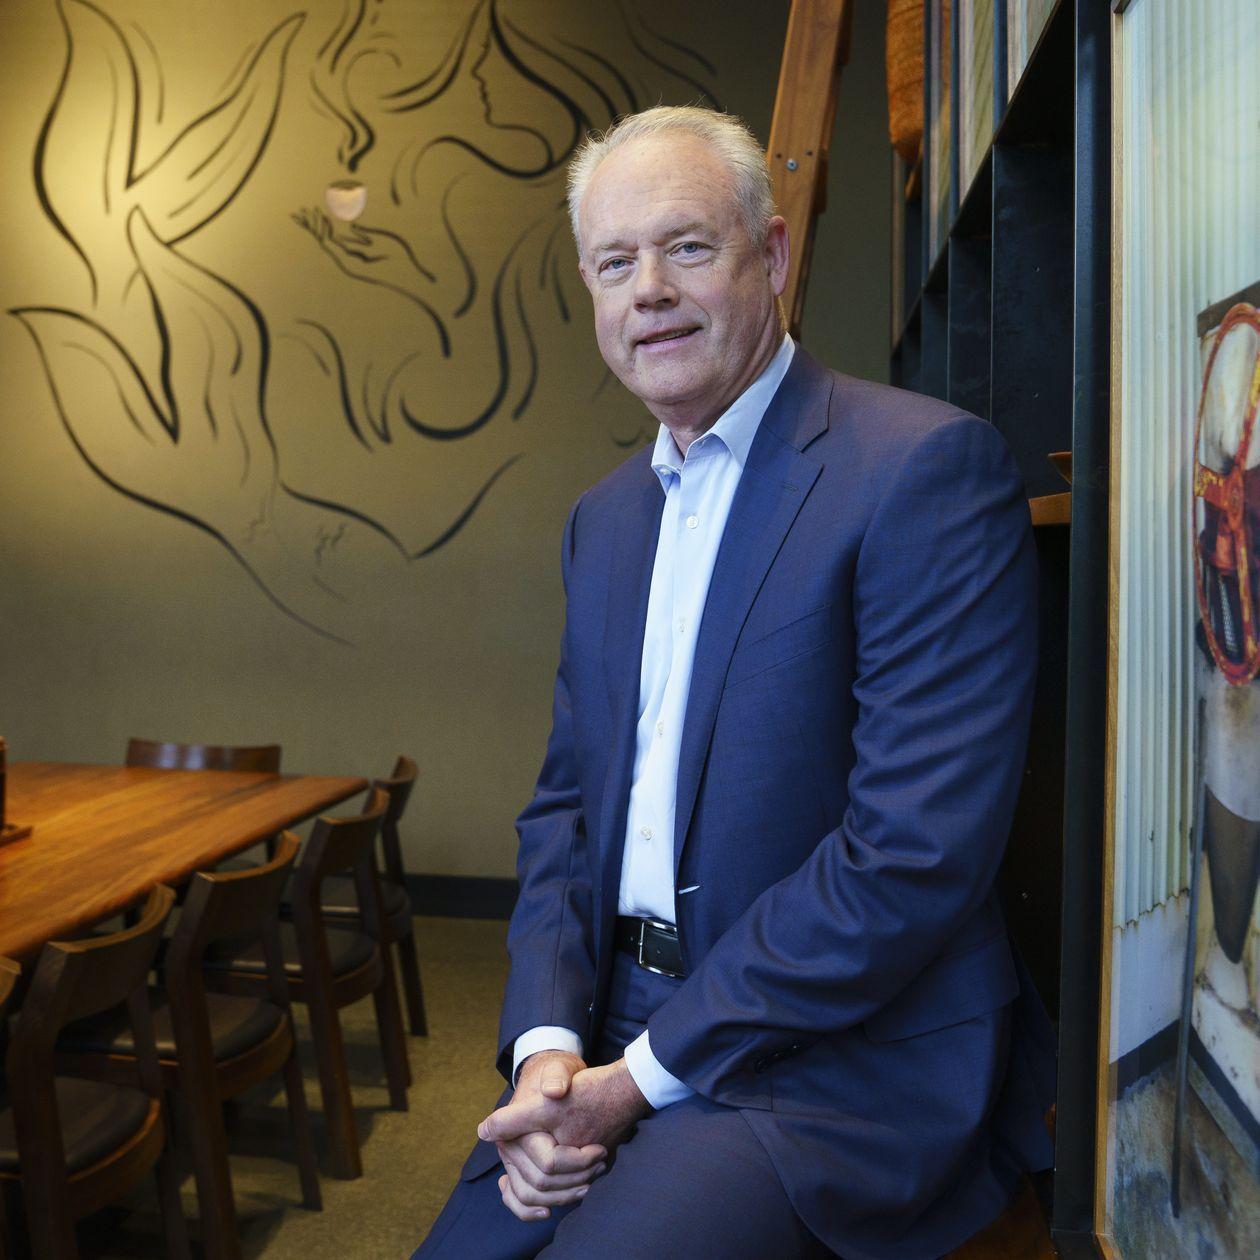 Meet the Starbucks CEO Who Has to Follow Howard Schultz